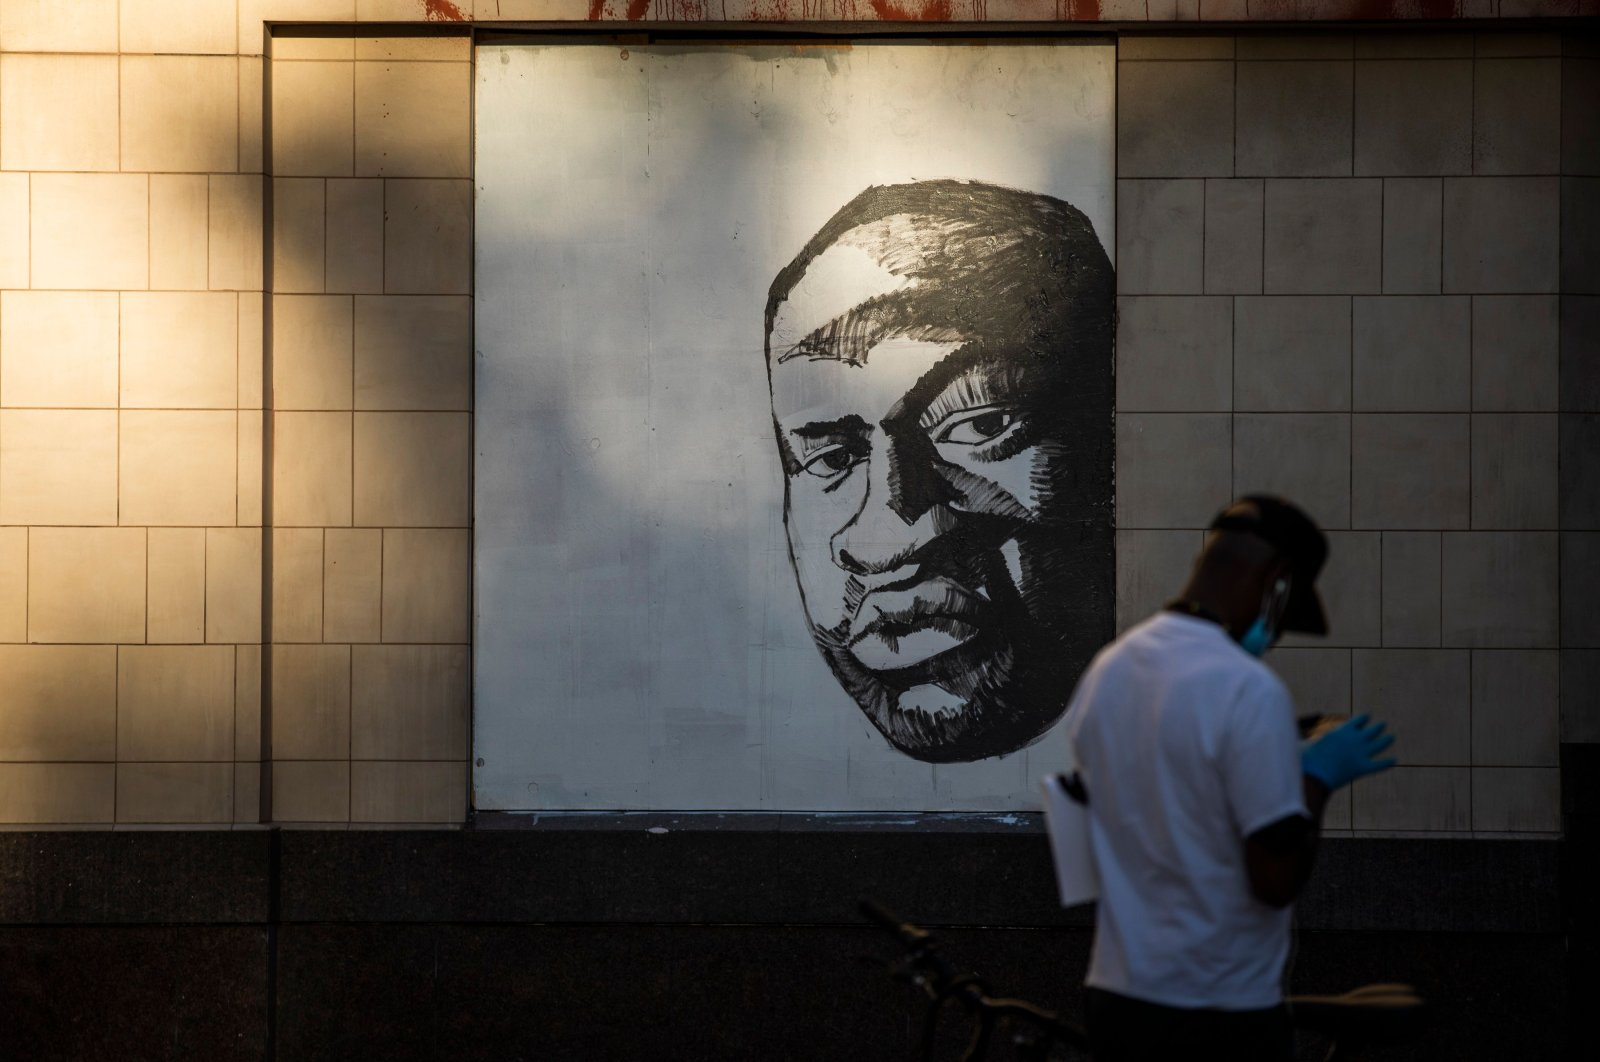 A mural of George Floyd is seen, Oakland, California, U.S., June 3, 2020. (AFP Photo)